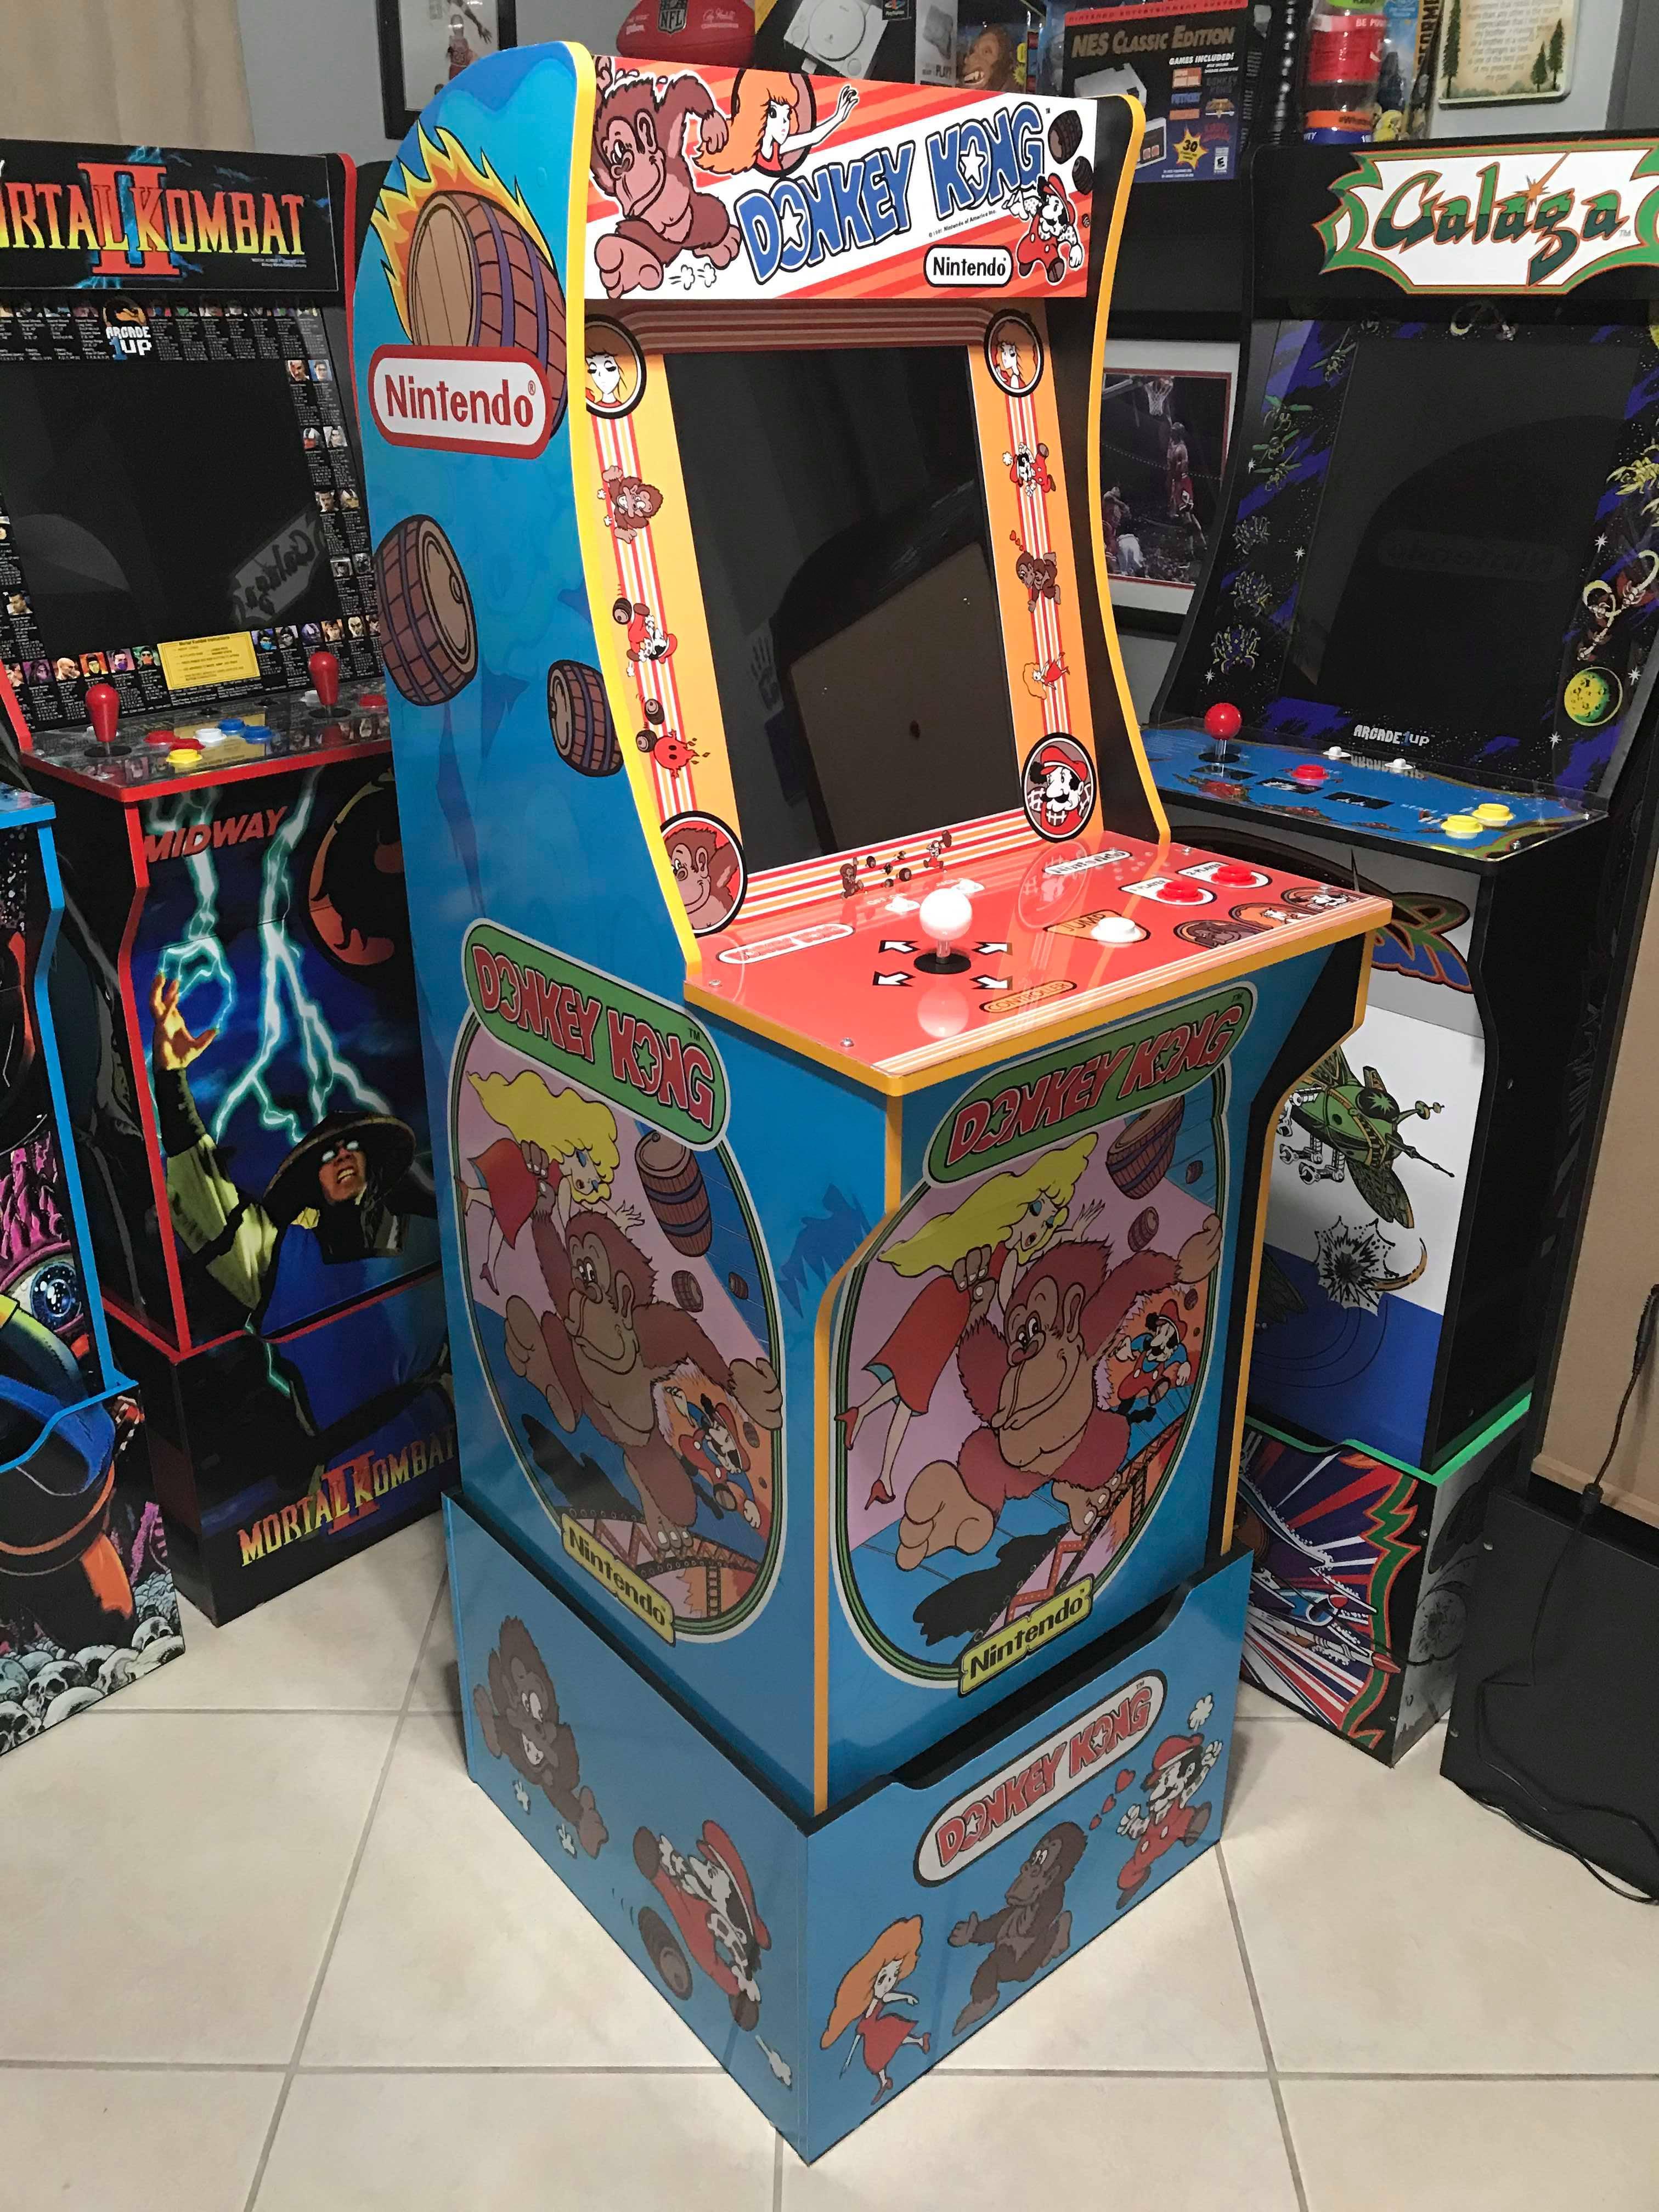 Arcade 1Up Donkey Kong Machine & Riser Decals Arcade1up